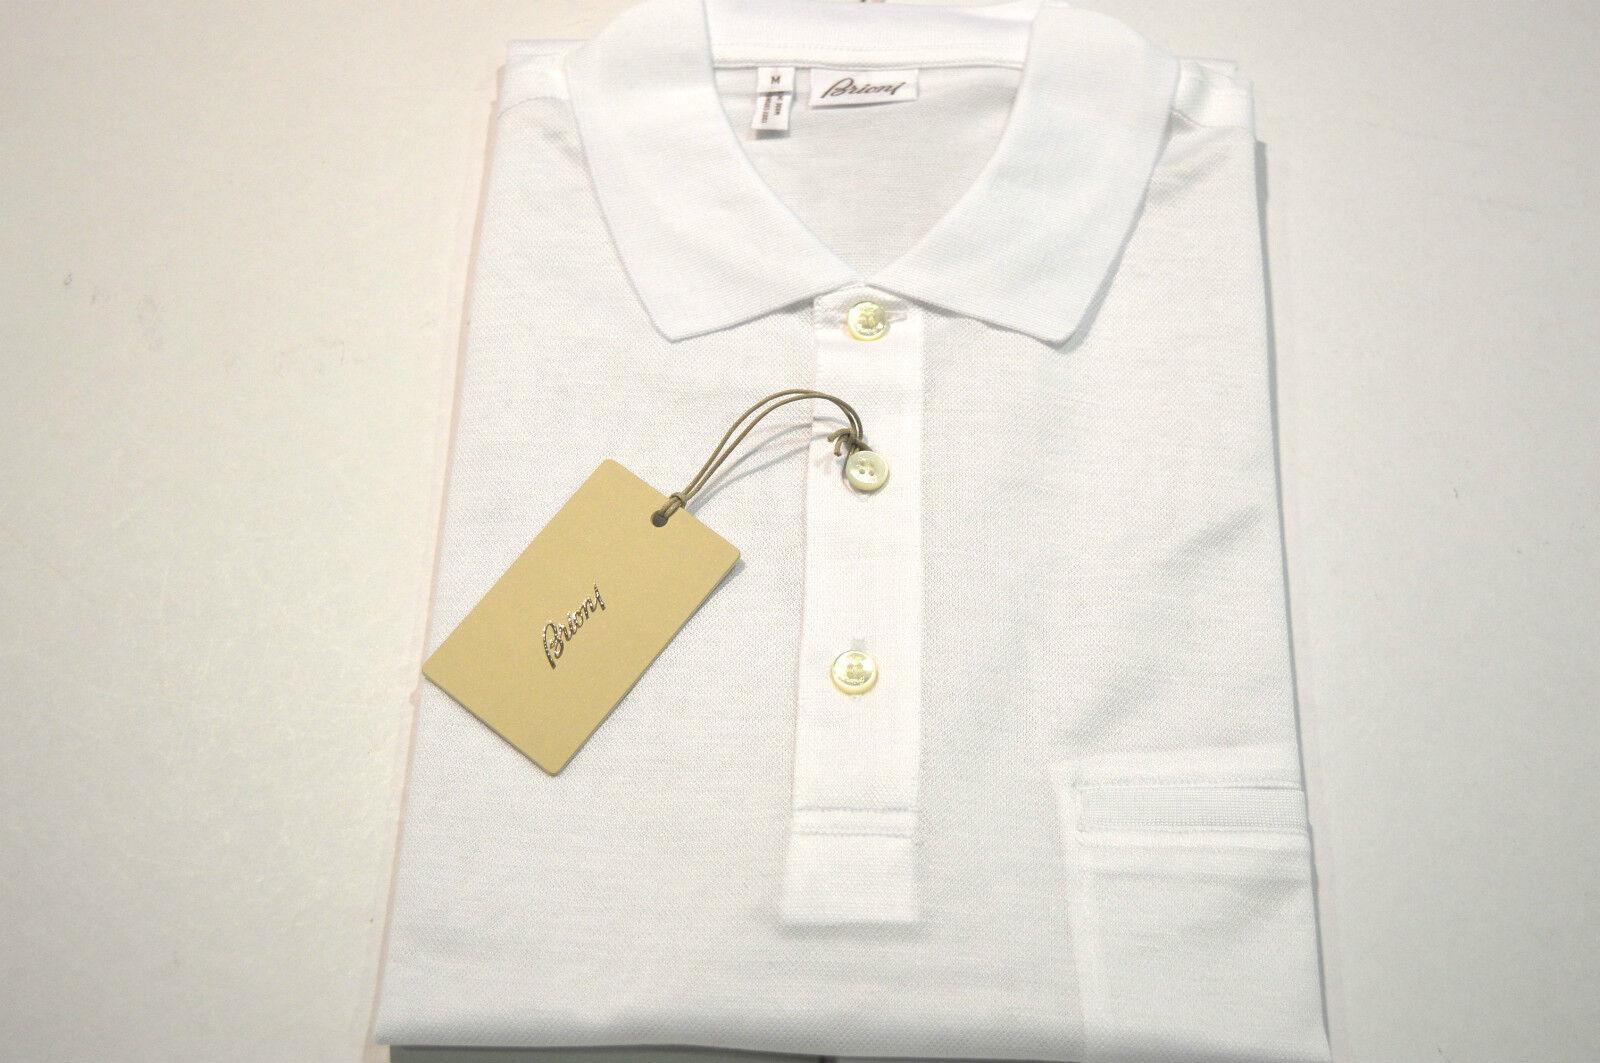 NEW  BRIONI Polo  Short Sleeve Cotton Größe M Us Eu 50 (Cod 4)